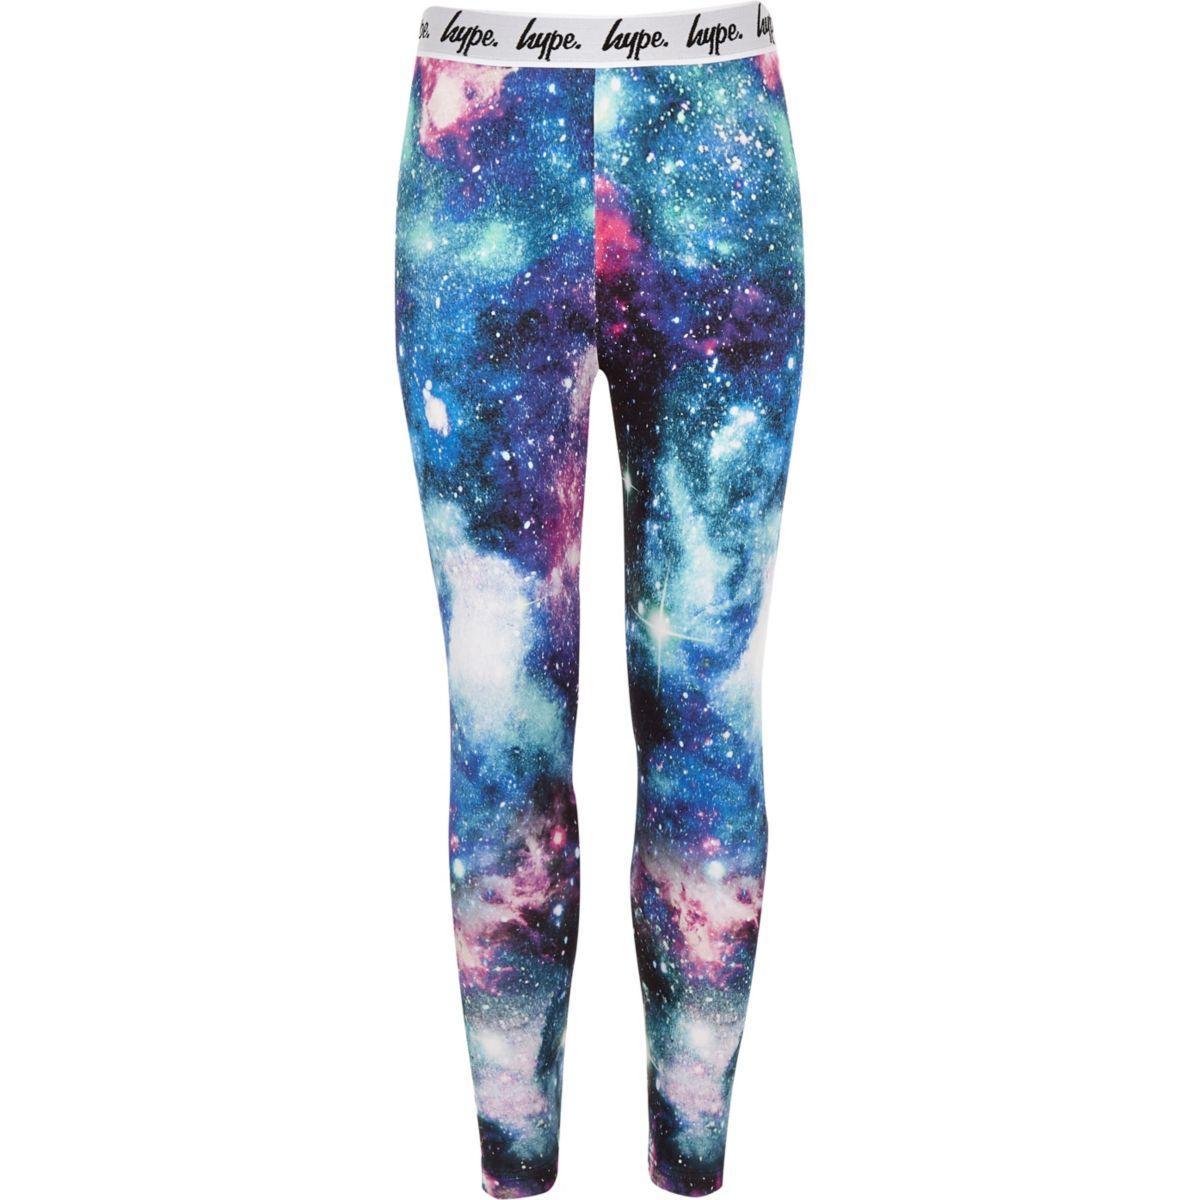 Girls Hype black galaxy print leggings